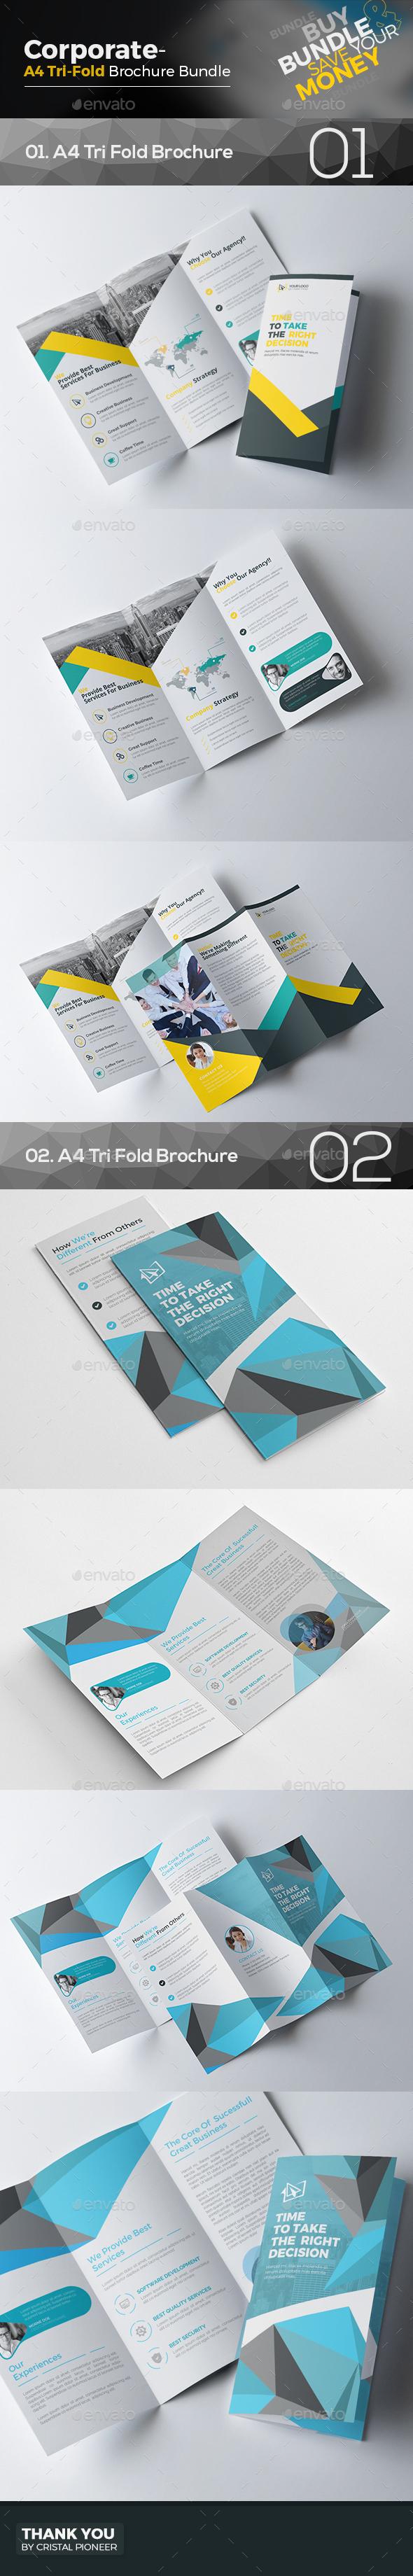 Tri Fold Brochure Bundle 2 In 1 By Cristalp Graphicriver